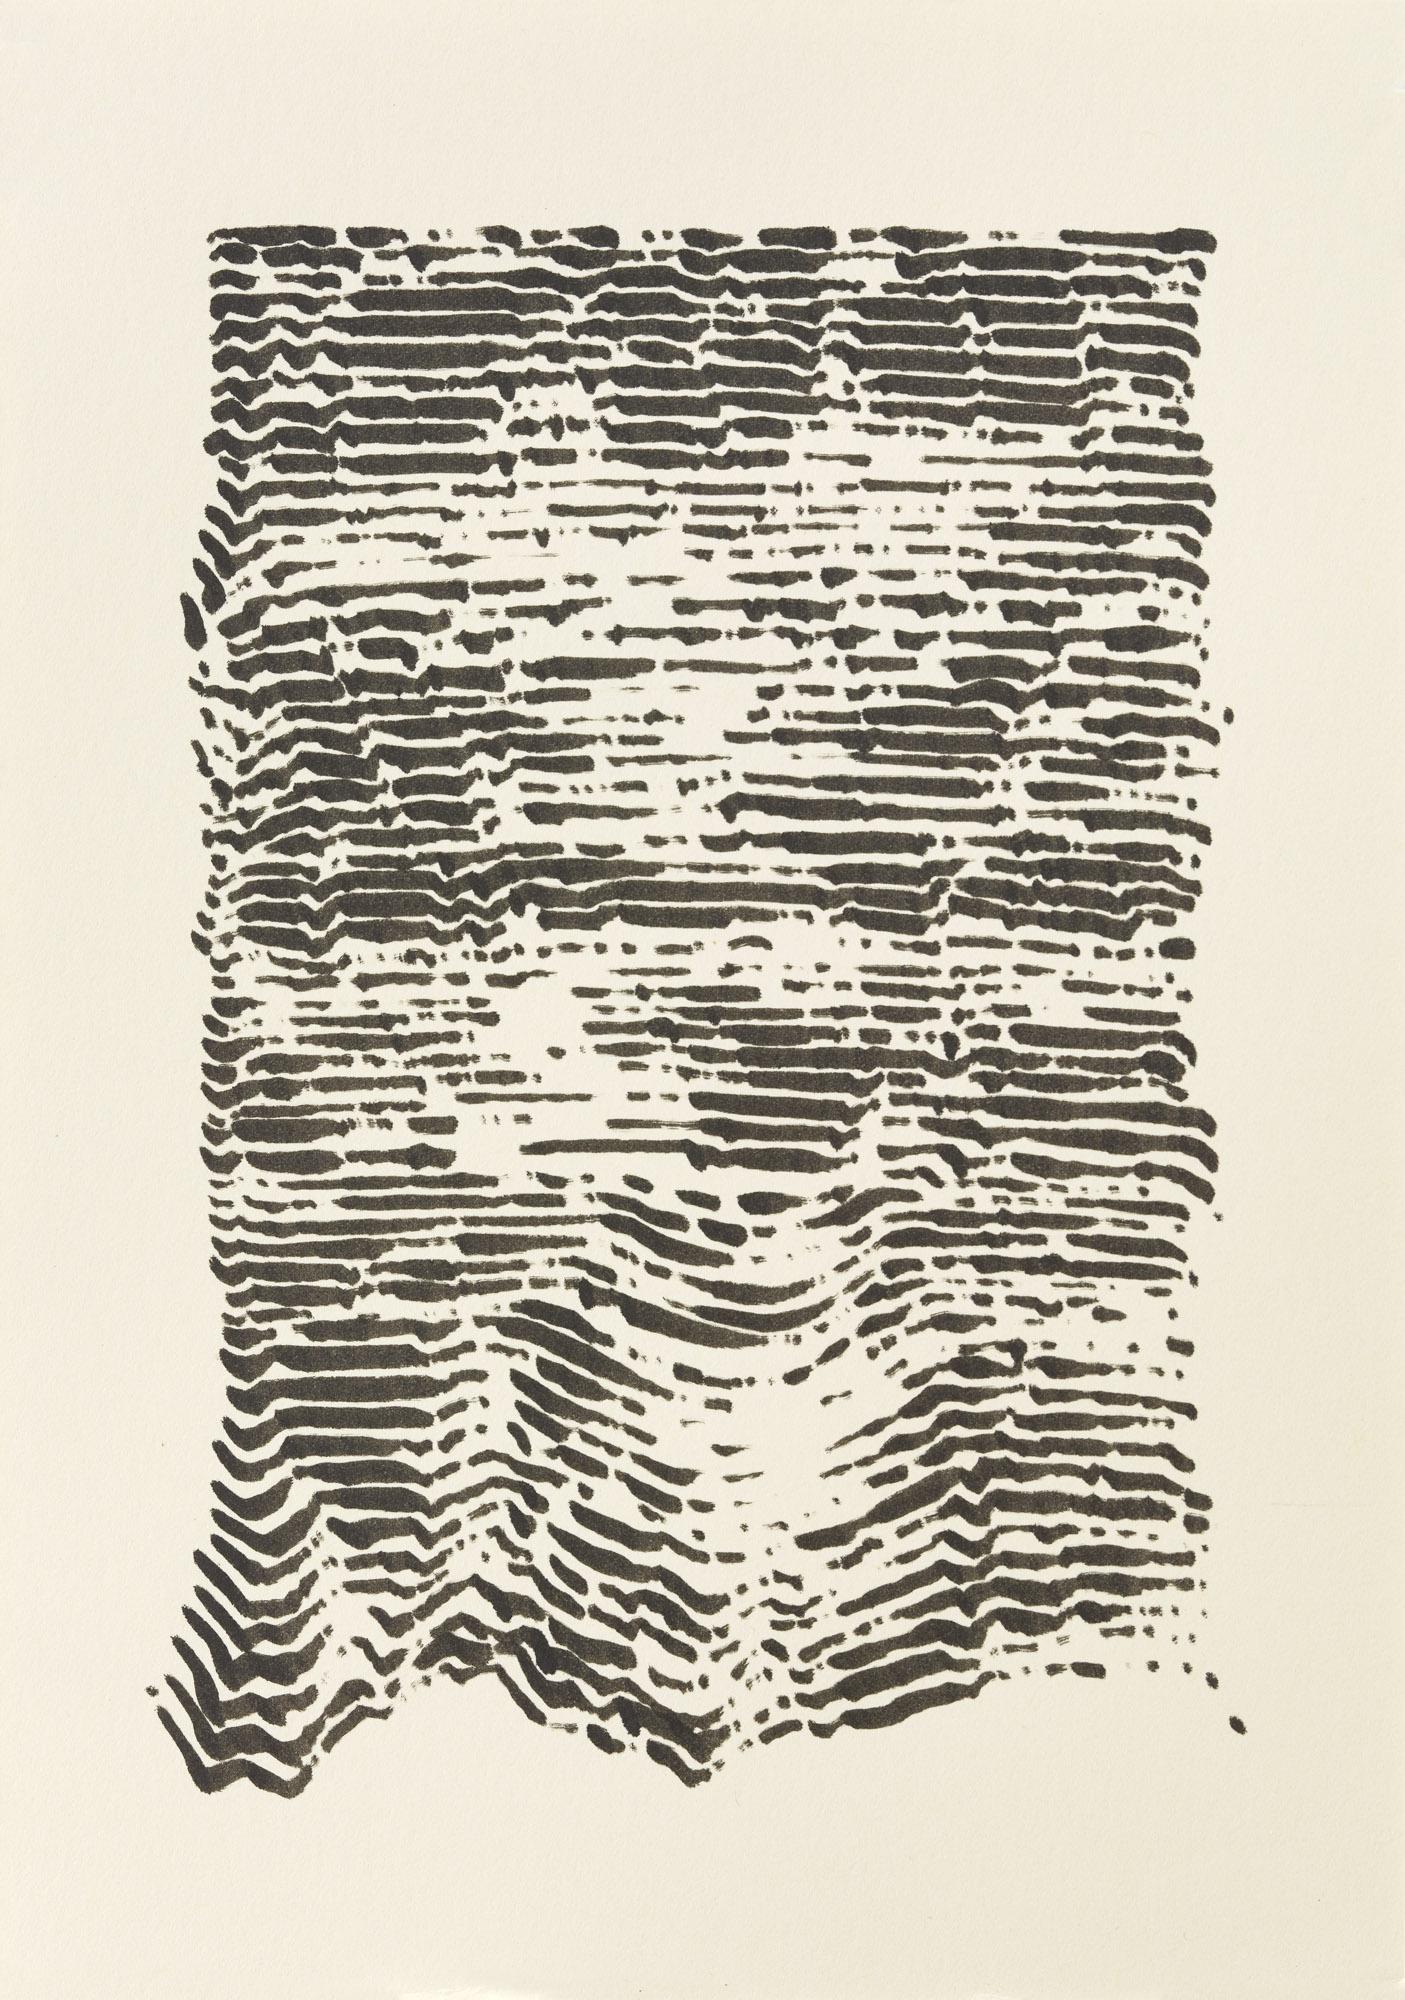 BK P7537 | untitled | ink on paper | 21x15cm | 2015